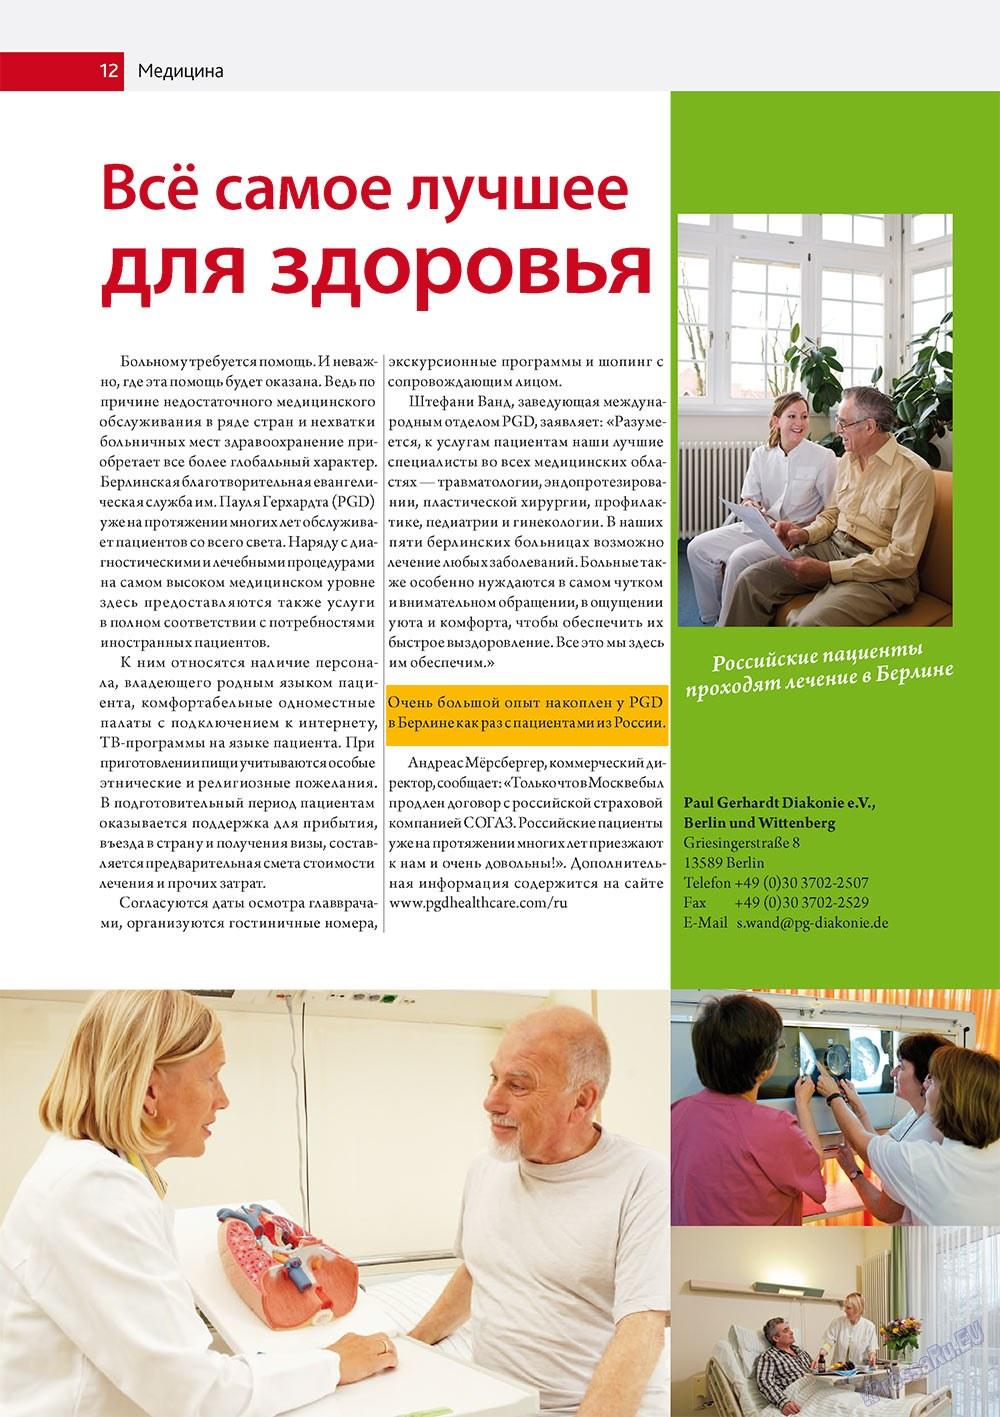 Бизнес парк (журнал). 2011 год, номер 4, стр. 12